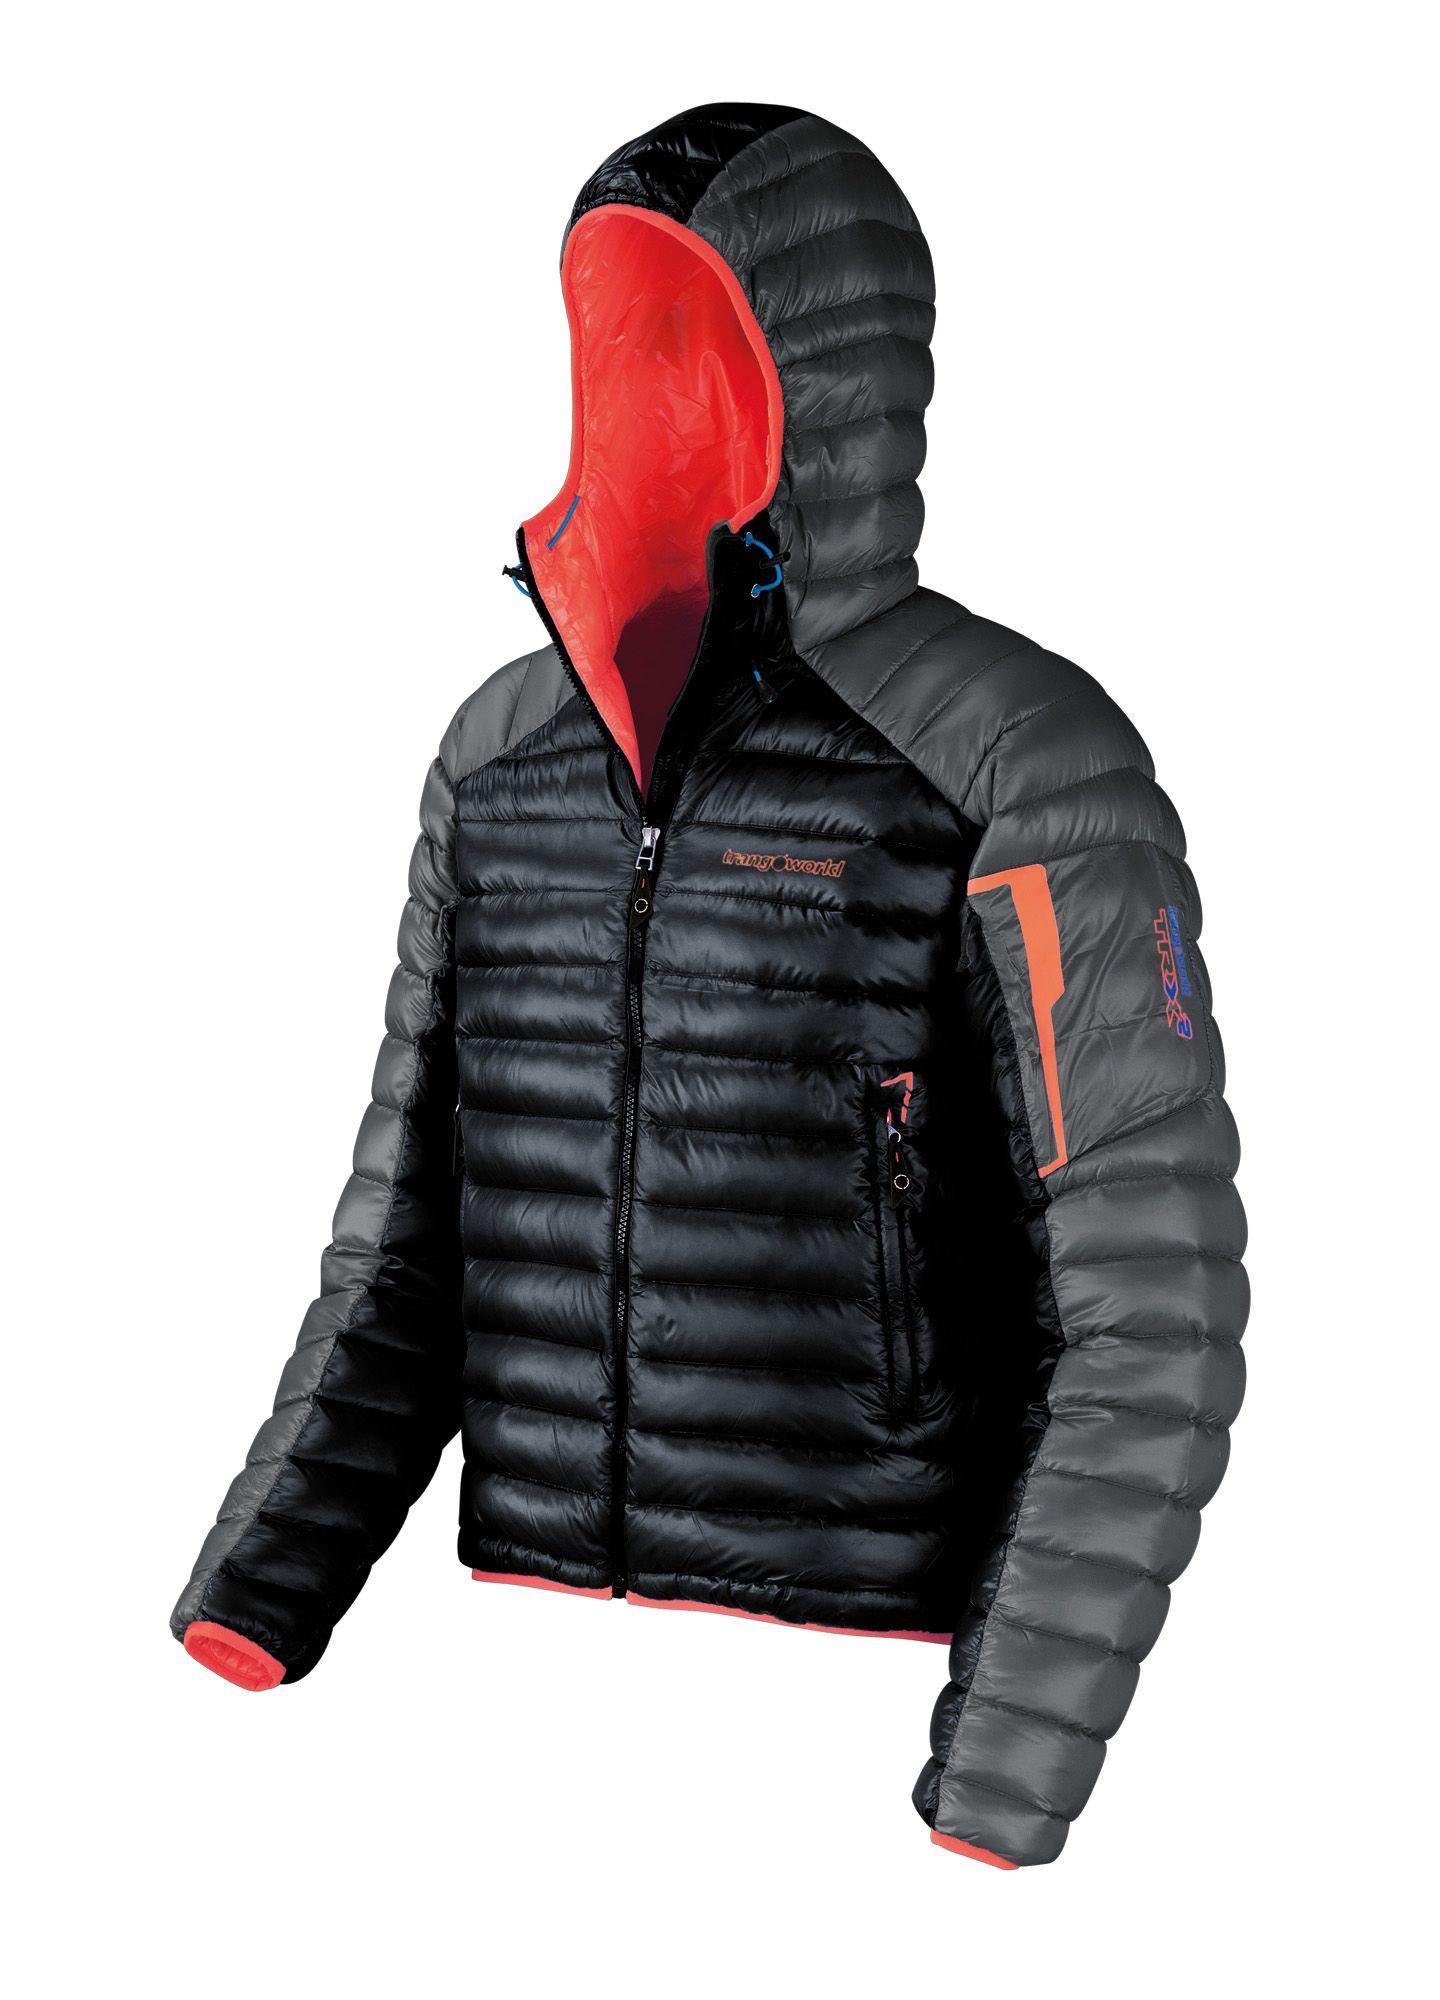 TRX2 for is 800 jacket jacket demanding maximum a The technical 7d1xqRF0